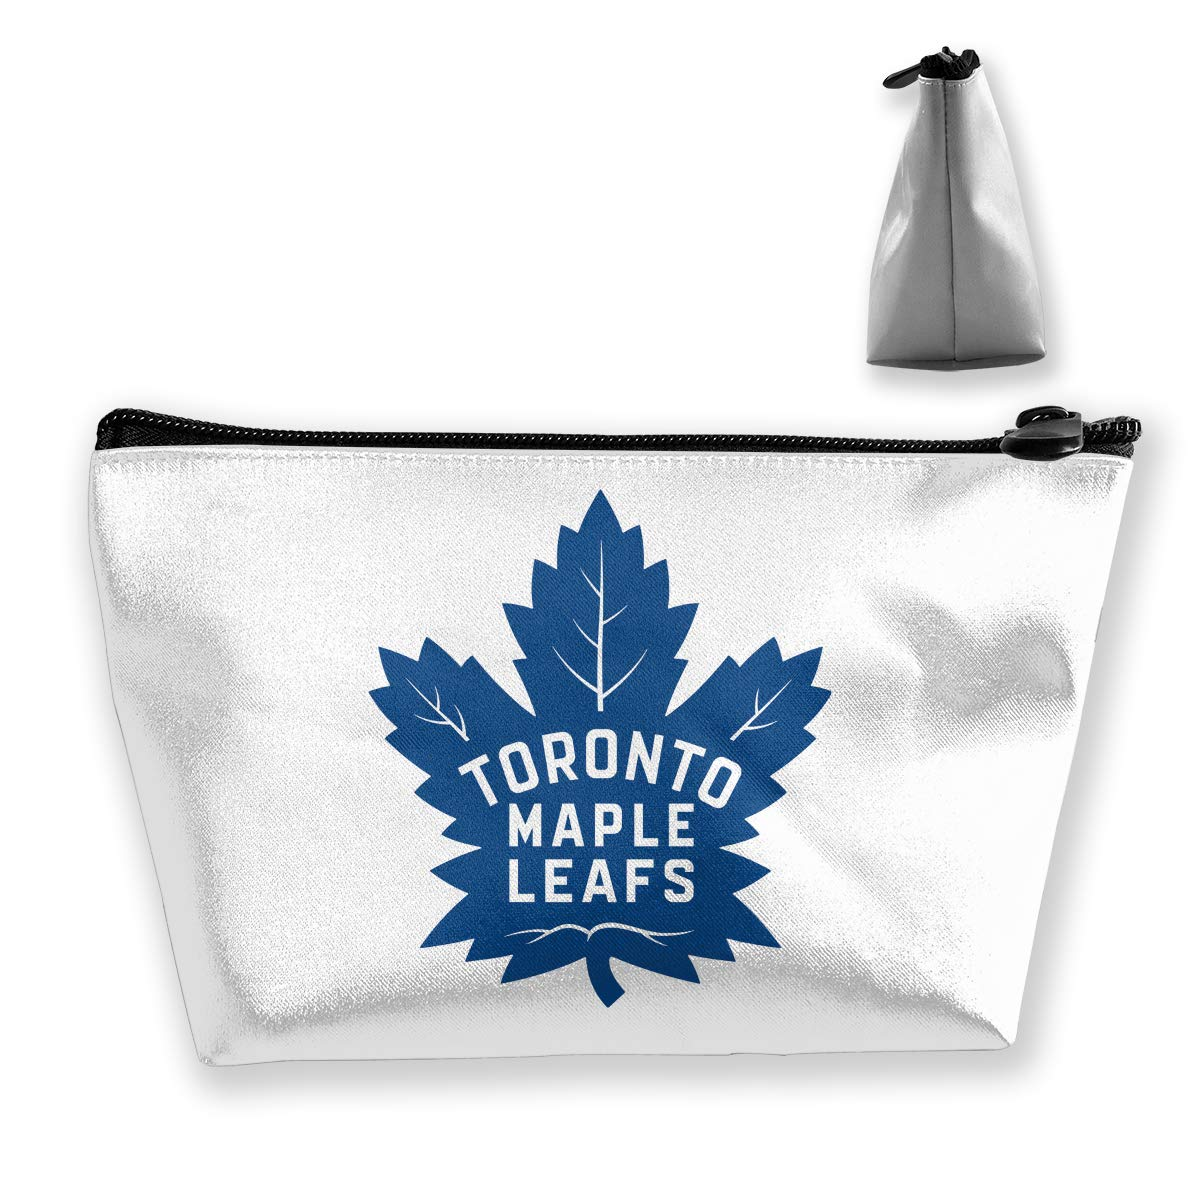 Trapezoidal Bag Makeup Bag Toronto Maple Leafs Logo Storage Portable Travel Wash Tote Zipper Wallet Handbag Carry Case hfaw